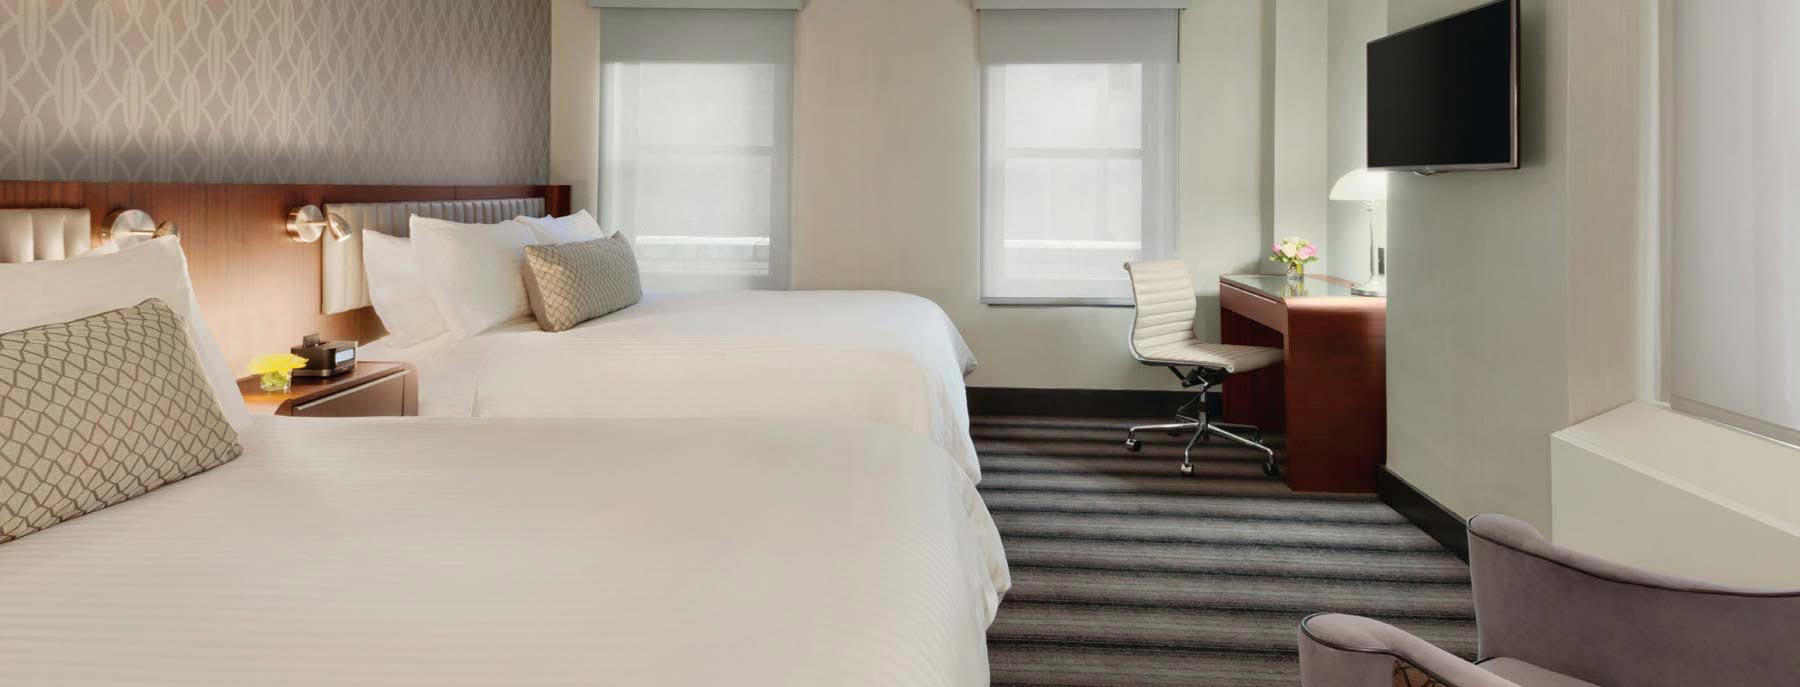 Rooms at Hotel Edison, New York